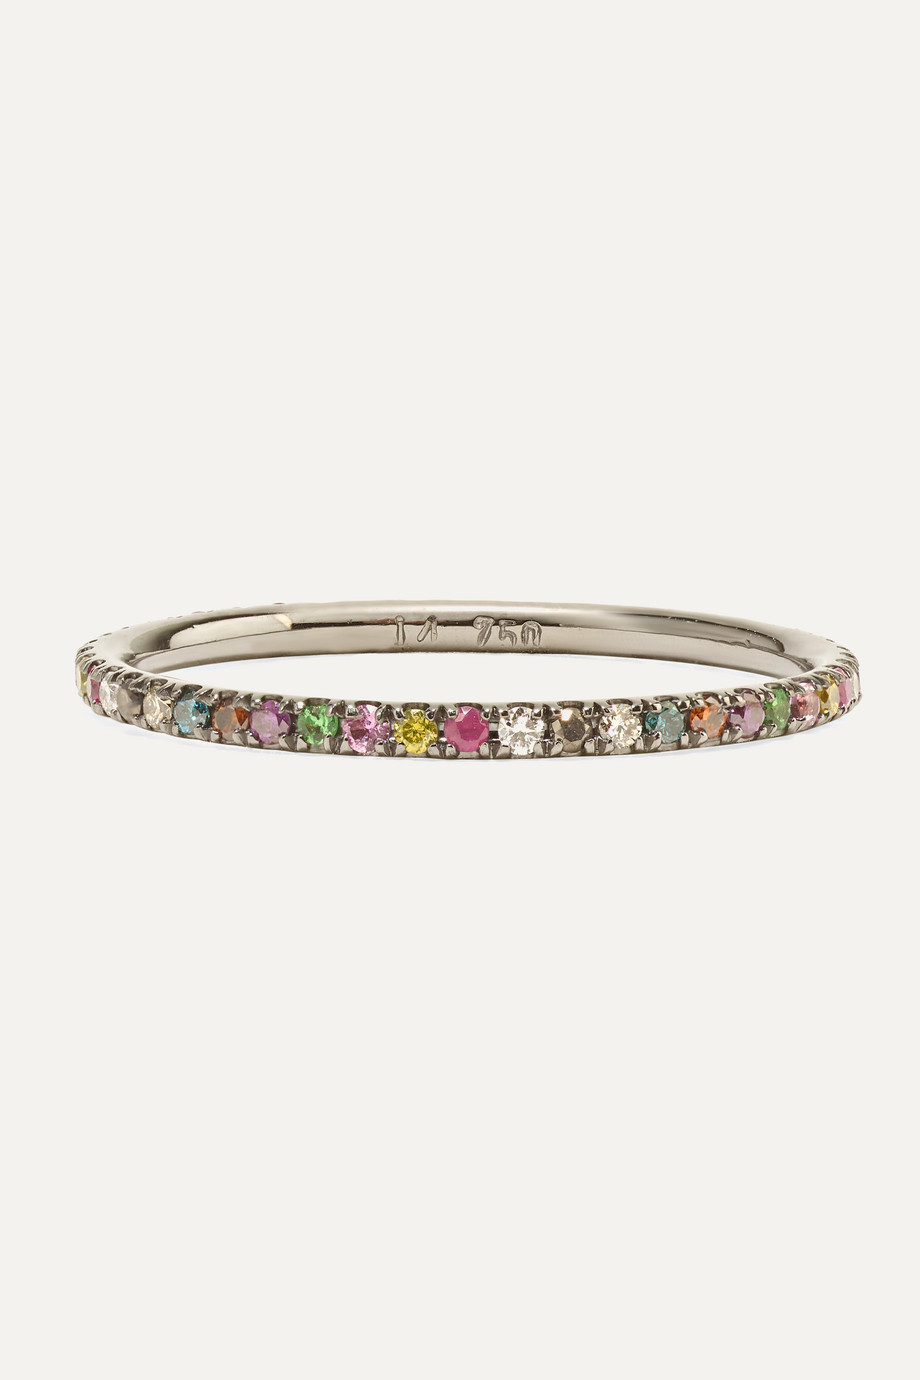 Ileana Makri Thread 18-karat blackened white gold multi-stone ring